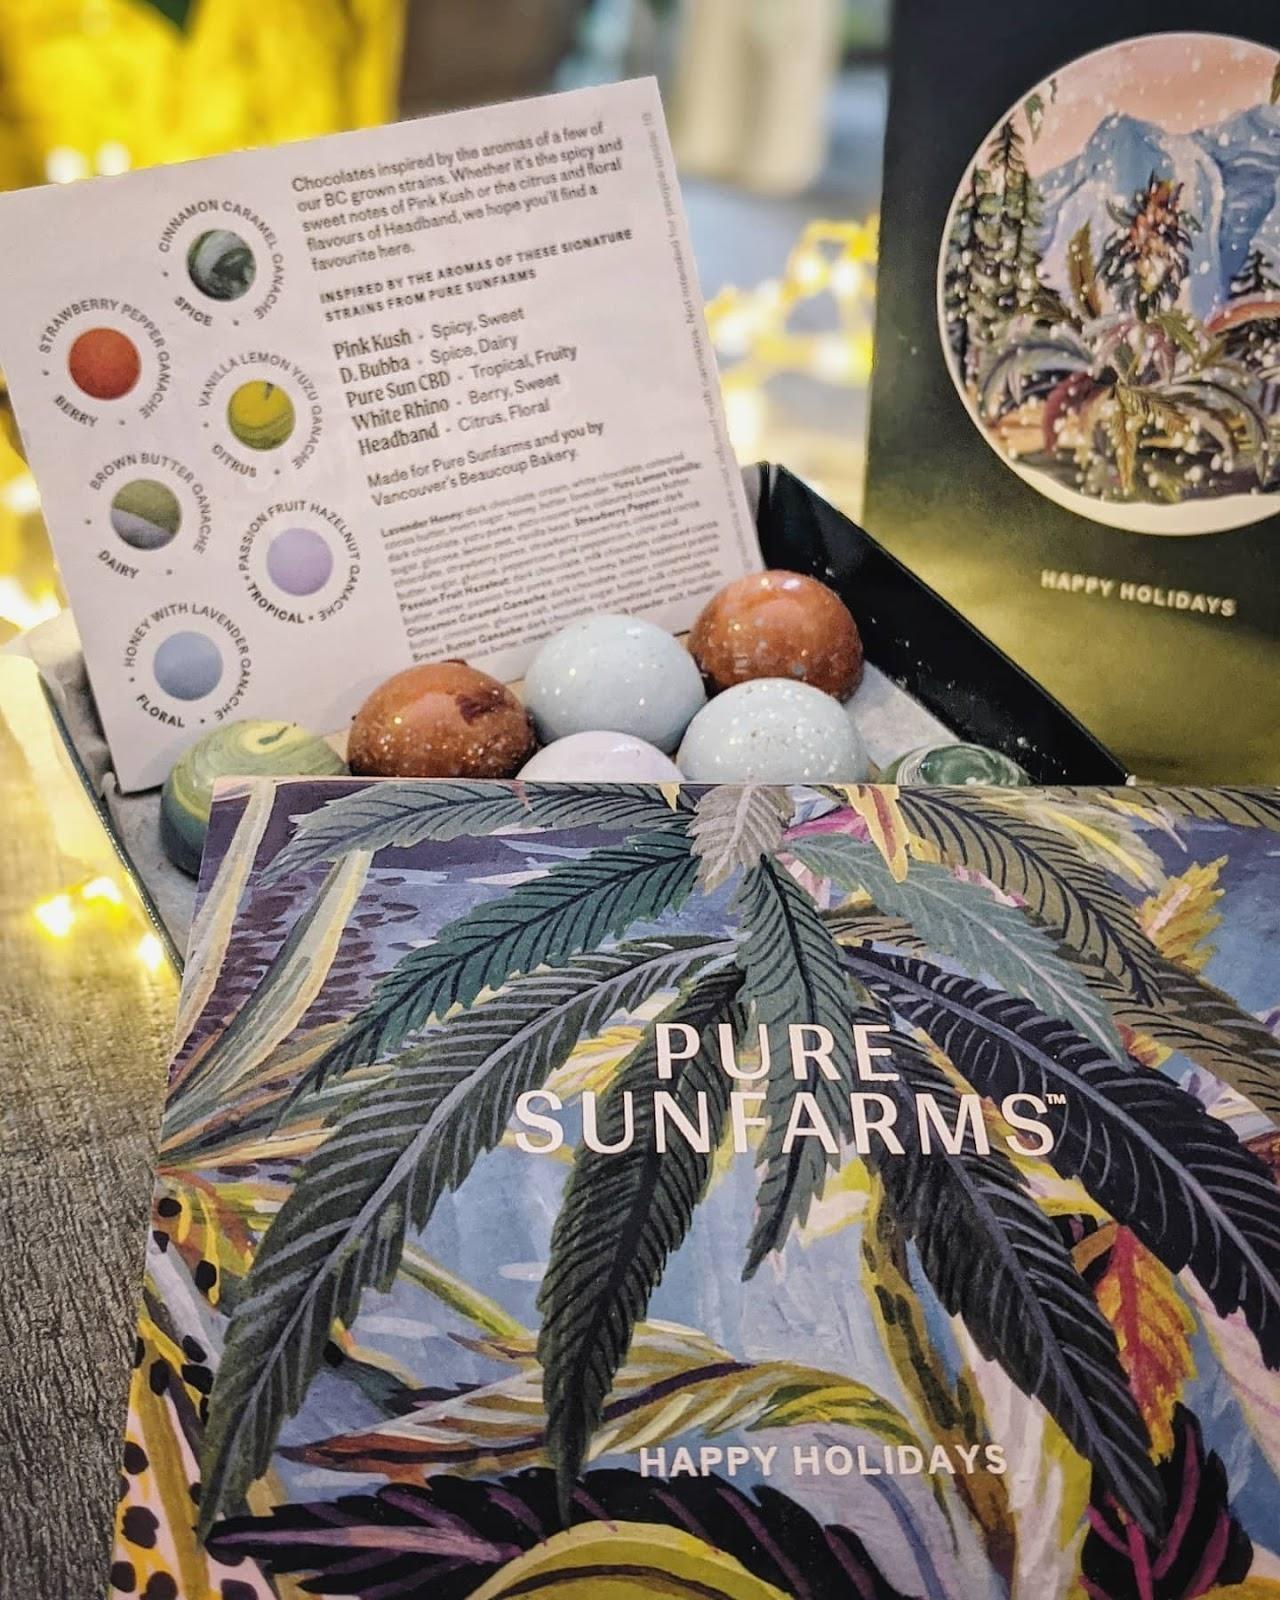 pure sunfarms chocolates cannabis campaigns we love